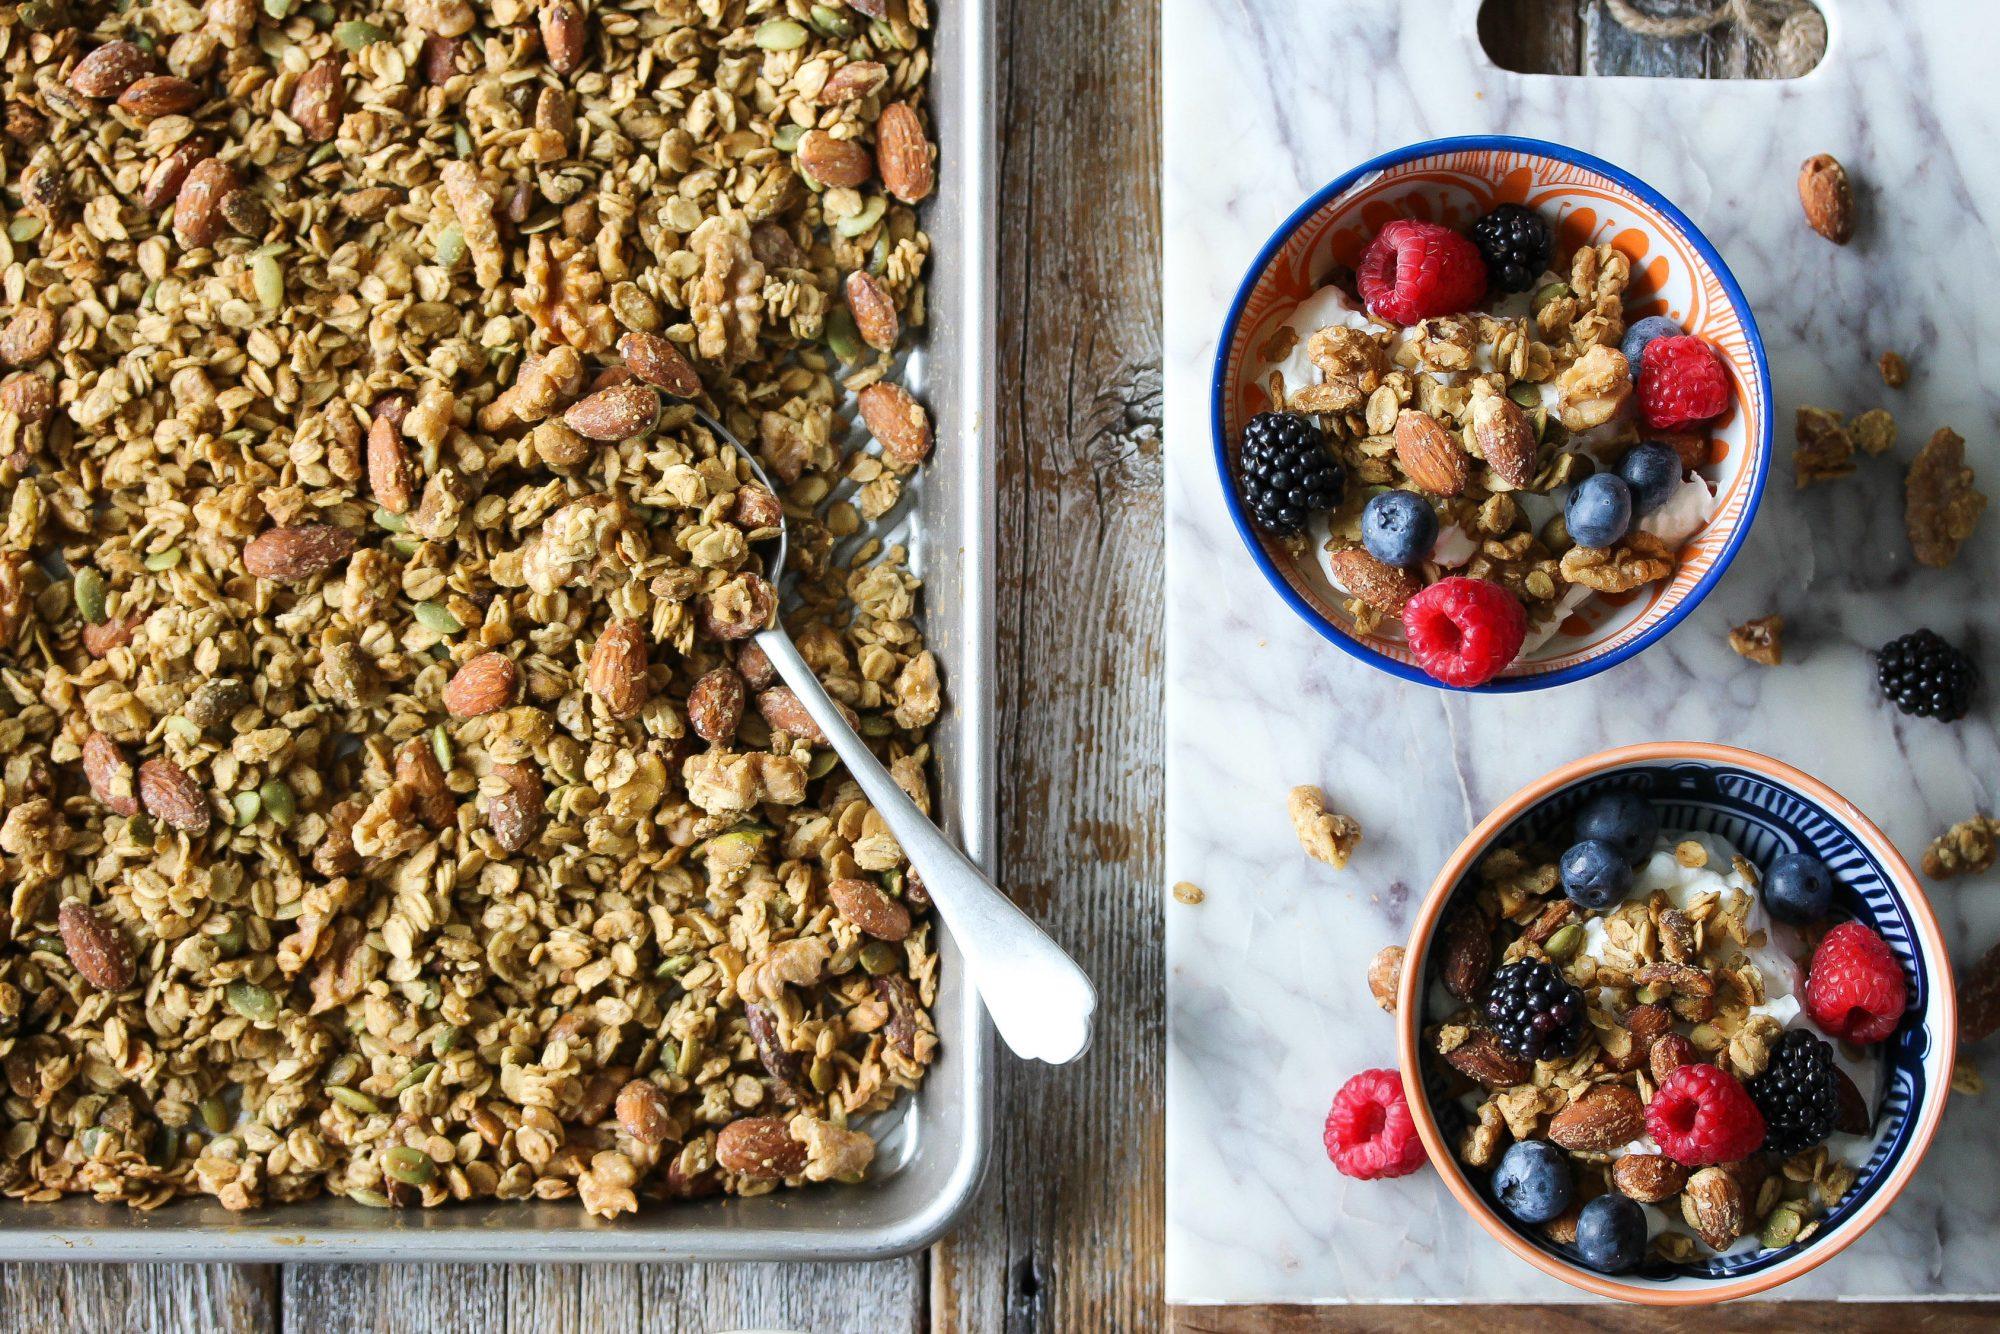 Jennifer Garner Has a Kid-Friendly Granola Recipe and It Looks Amazing TahiniCardamomGranola